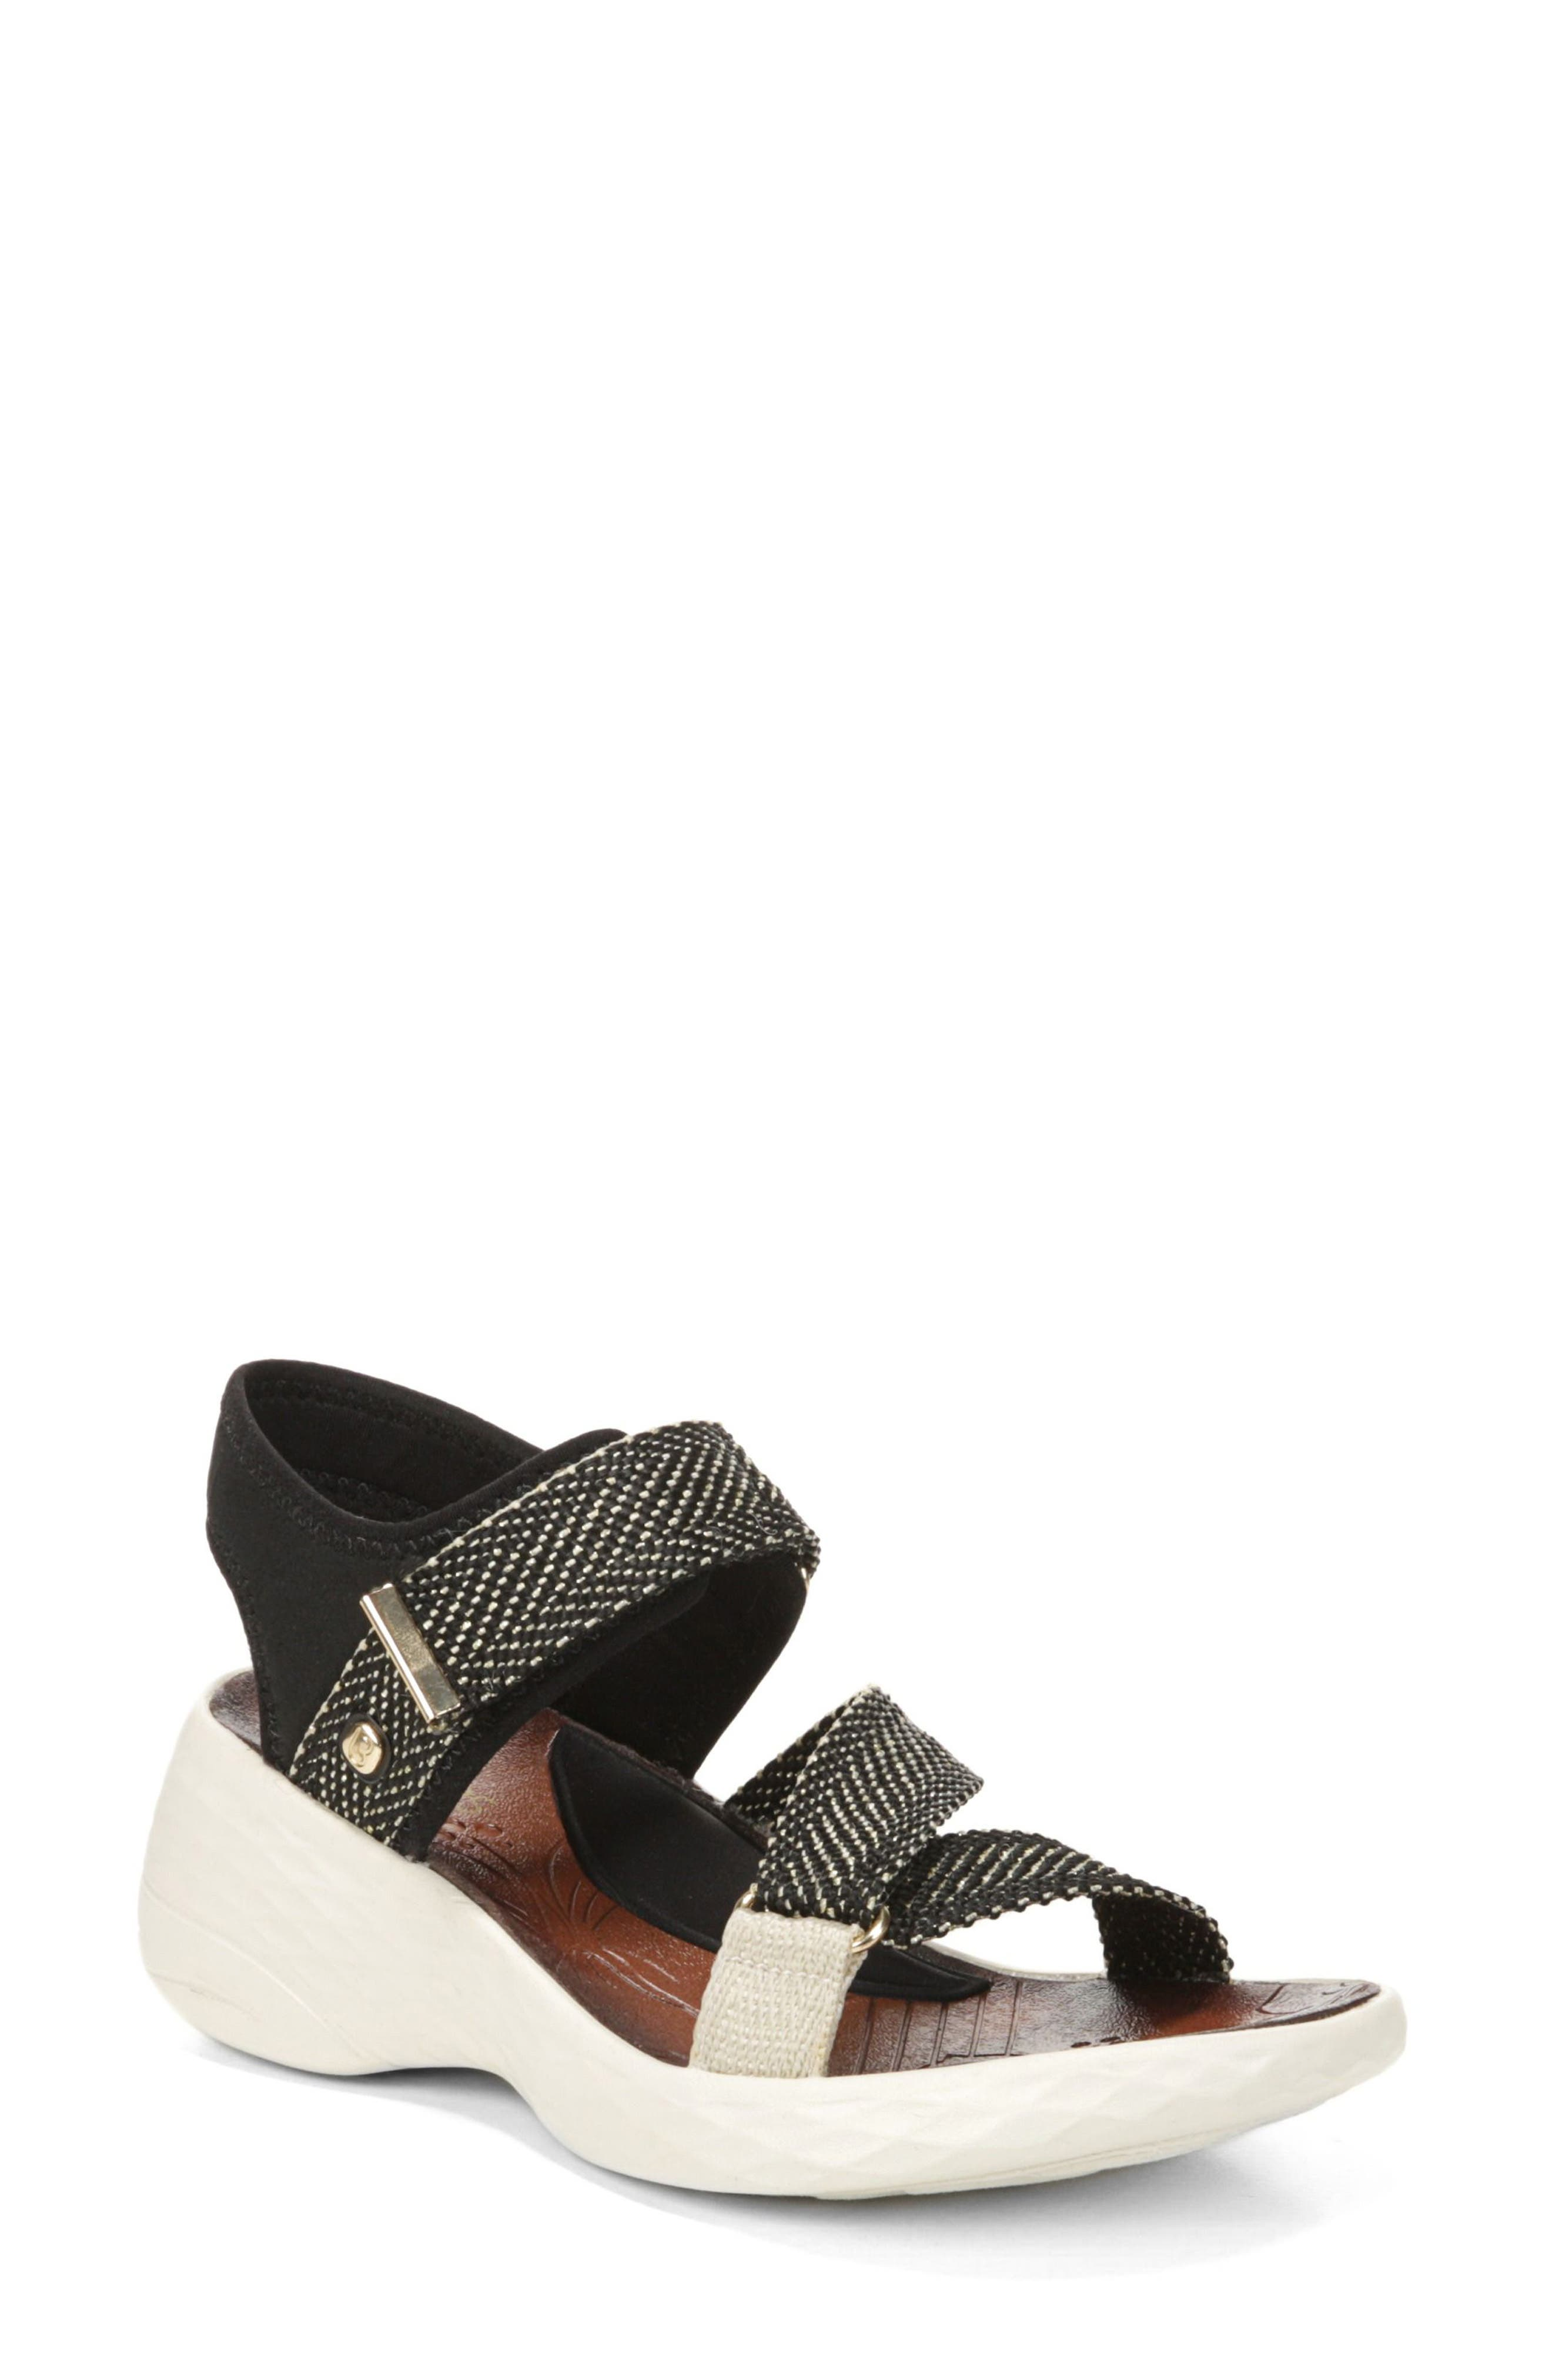 Jive Sandal,                         Main,                         color, 003